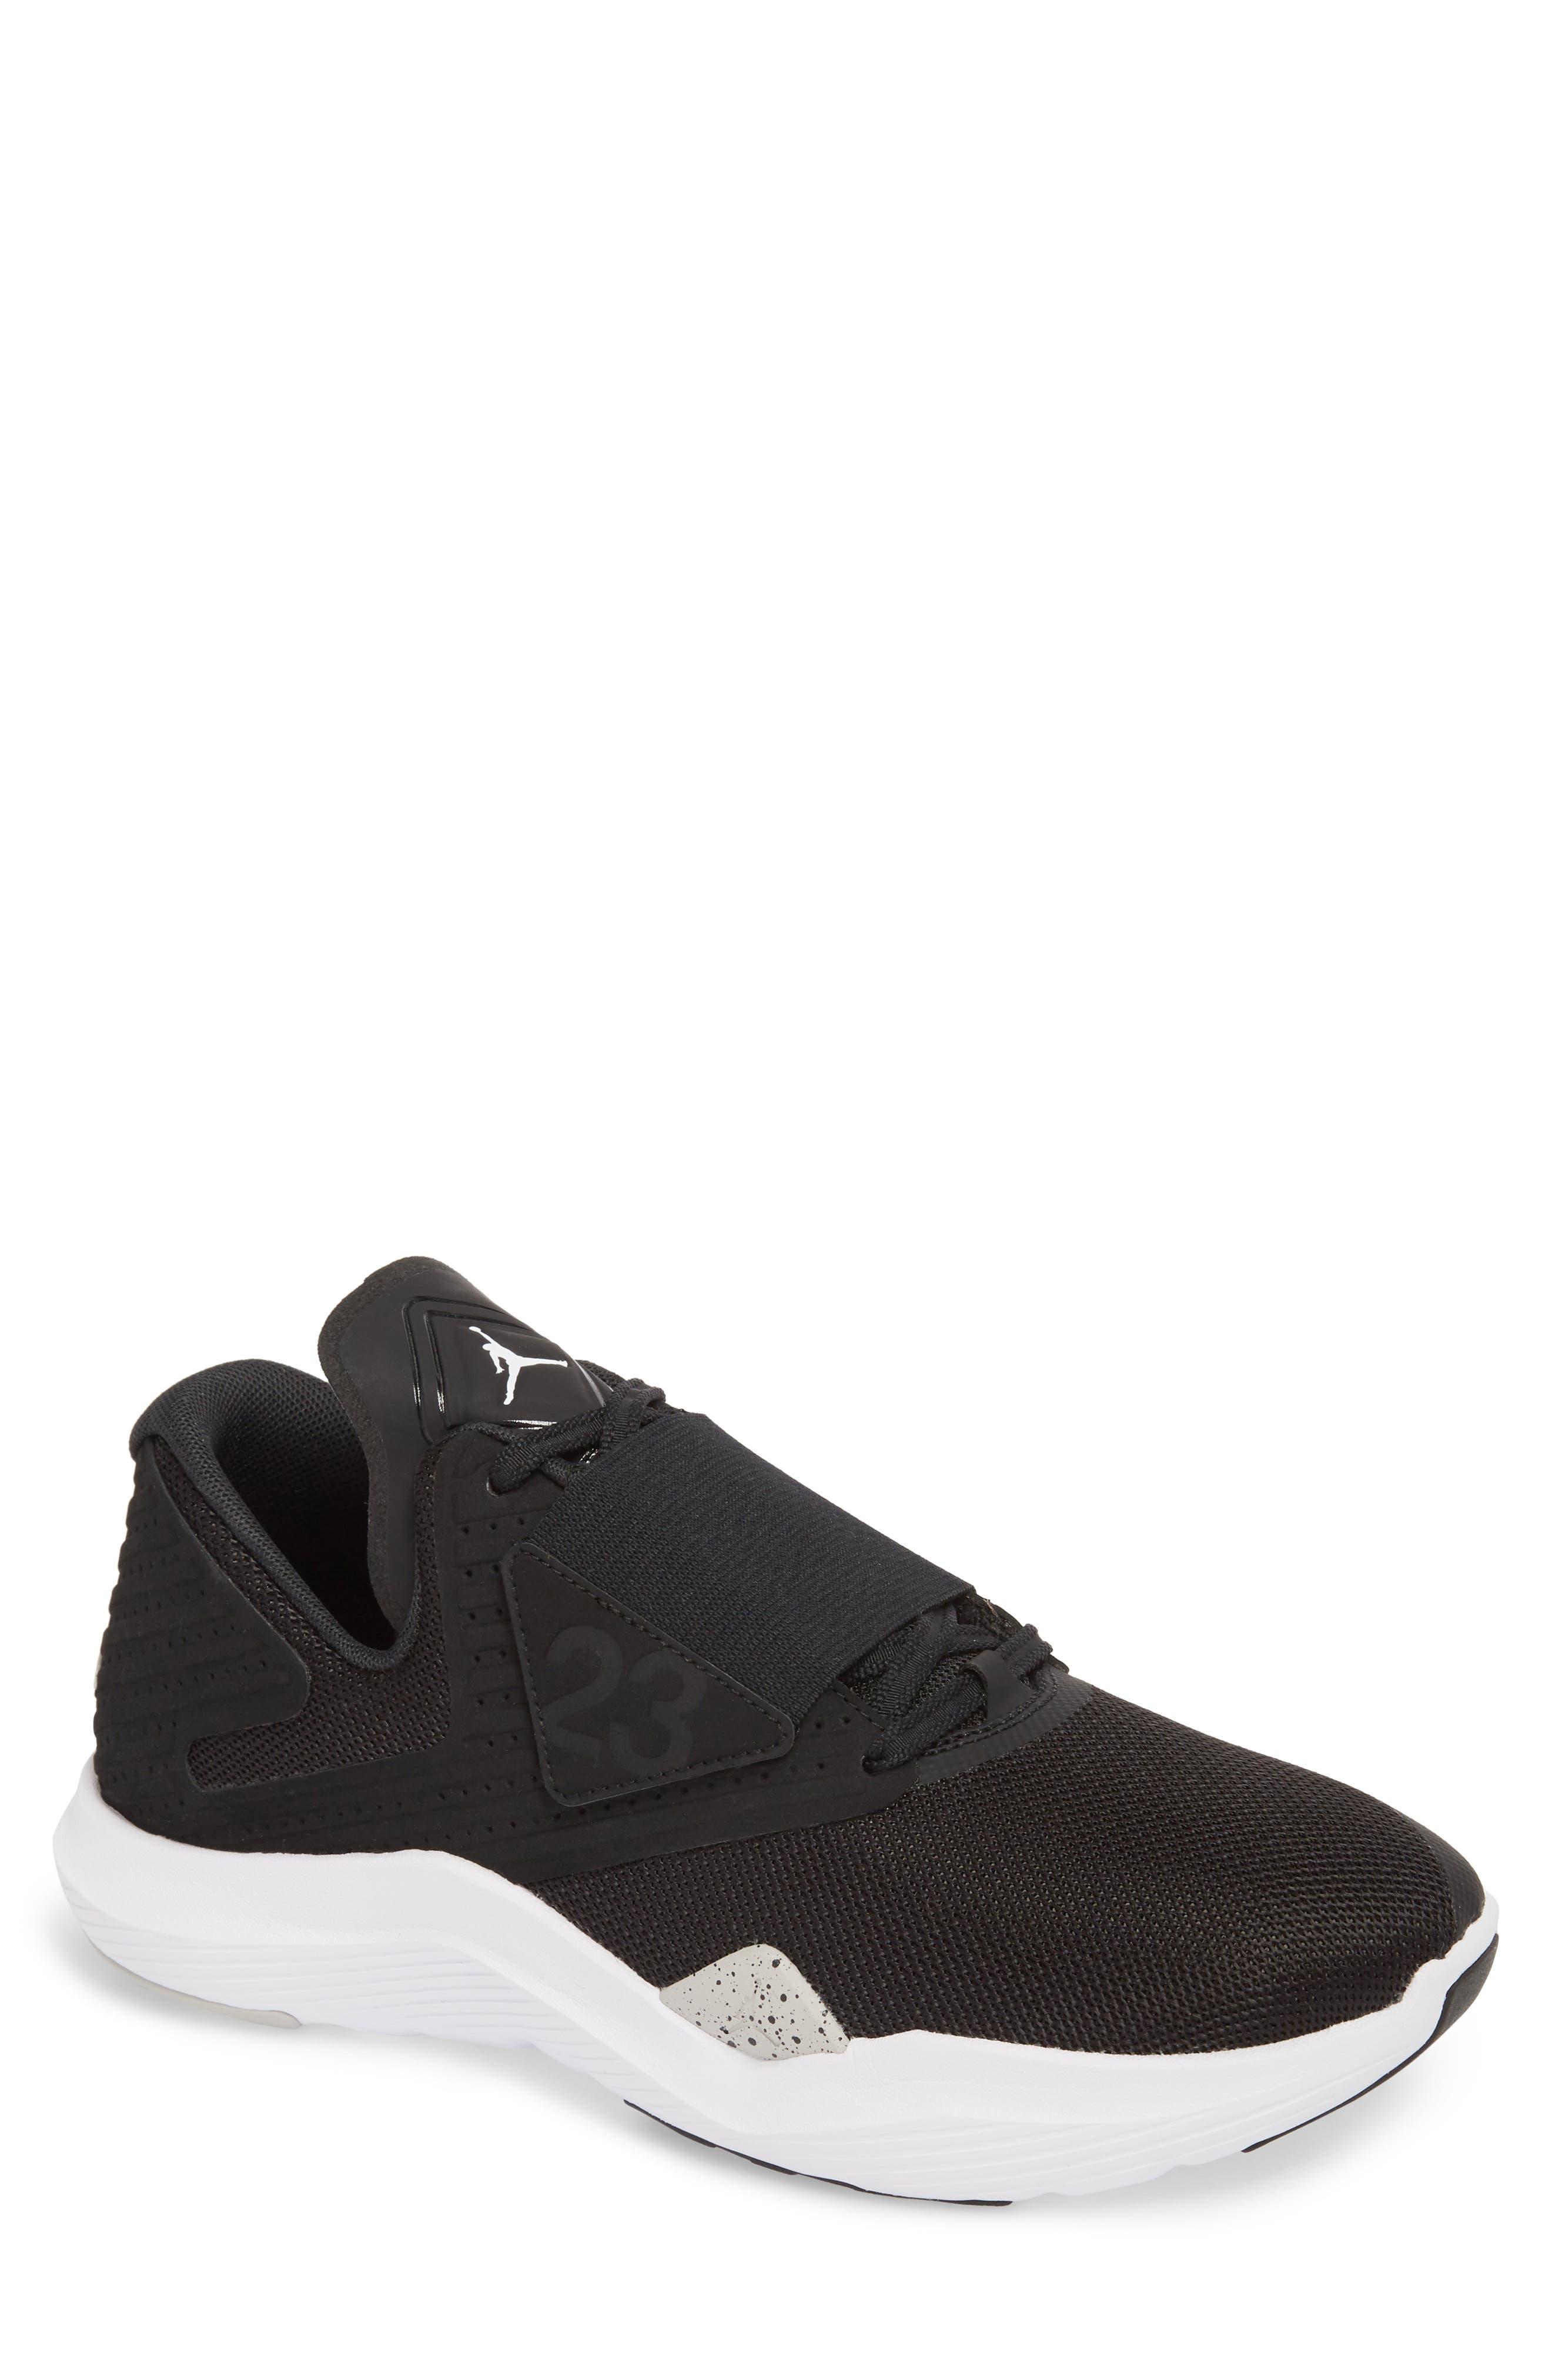 Air Jordan Relentless Training Sneaker,                             Main thumbnail 1, color,                             BLACK/ TECH GREY/ WHITE